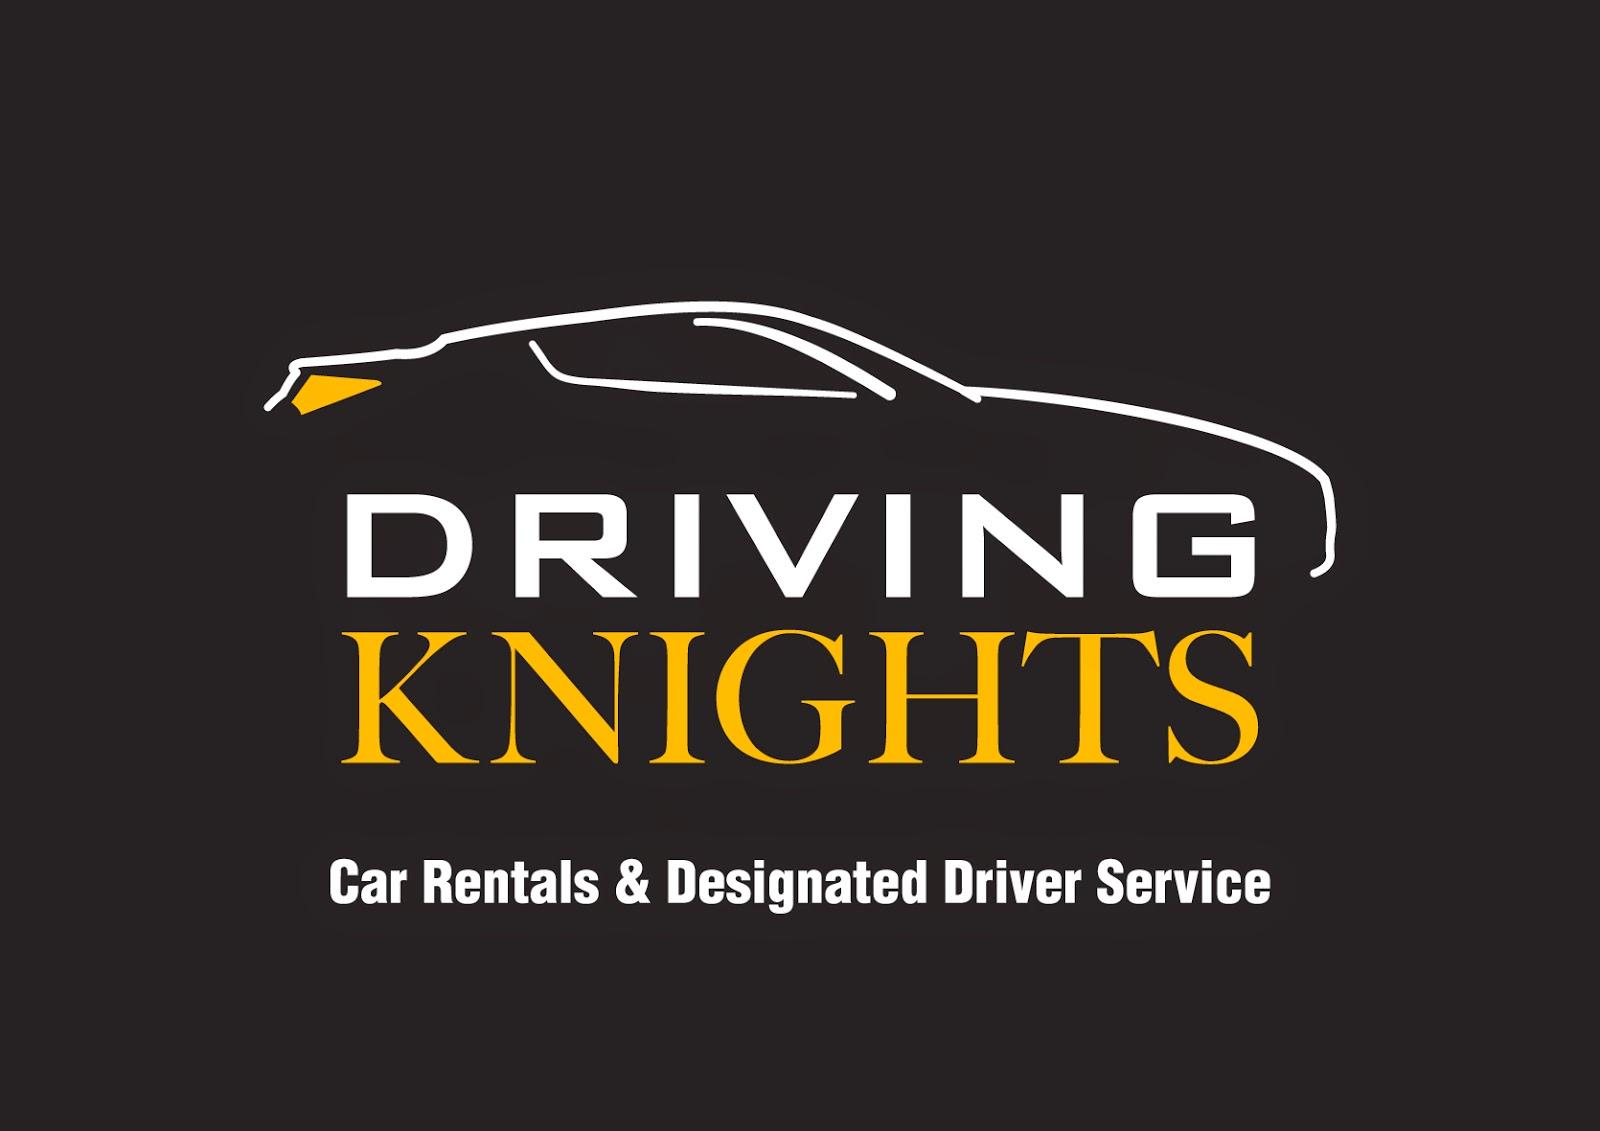 Car rental broker business